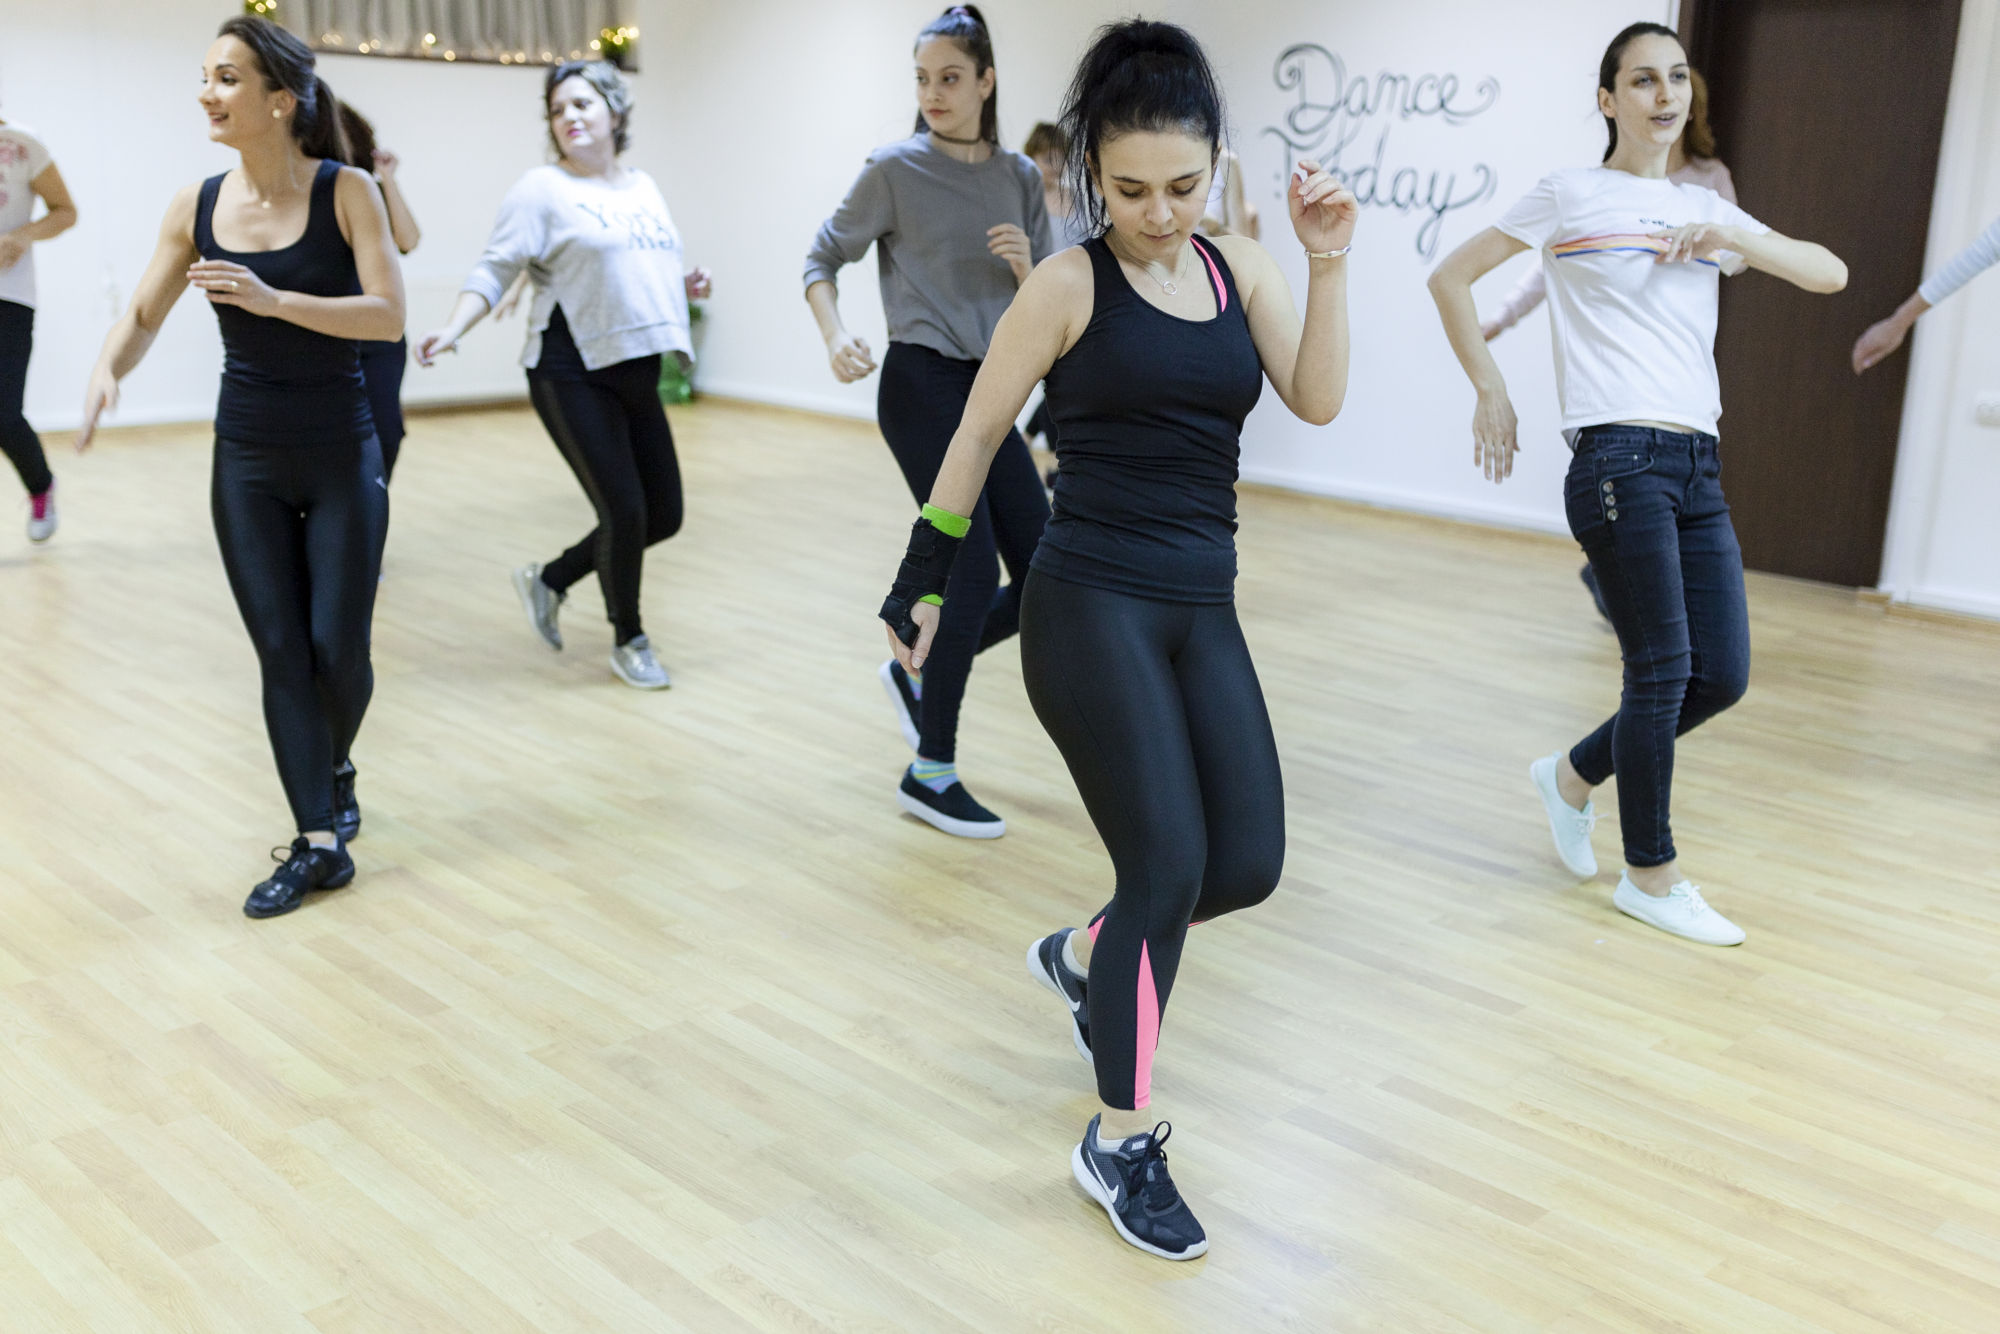 doamne si domnisoare dansand la Dance Today in Bucuresti